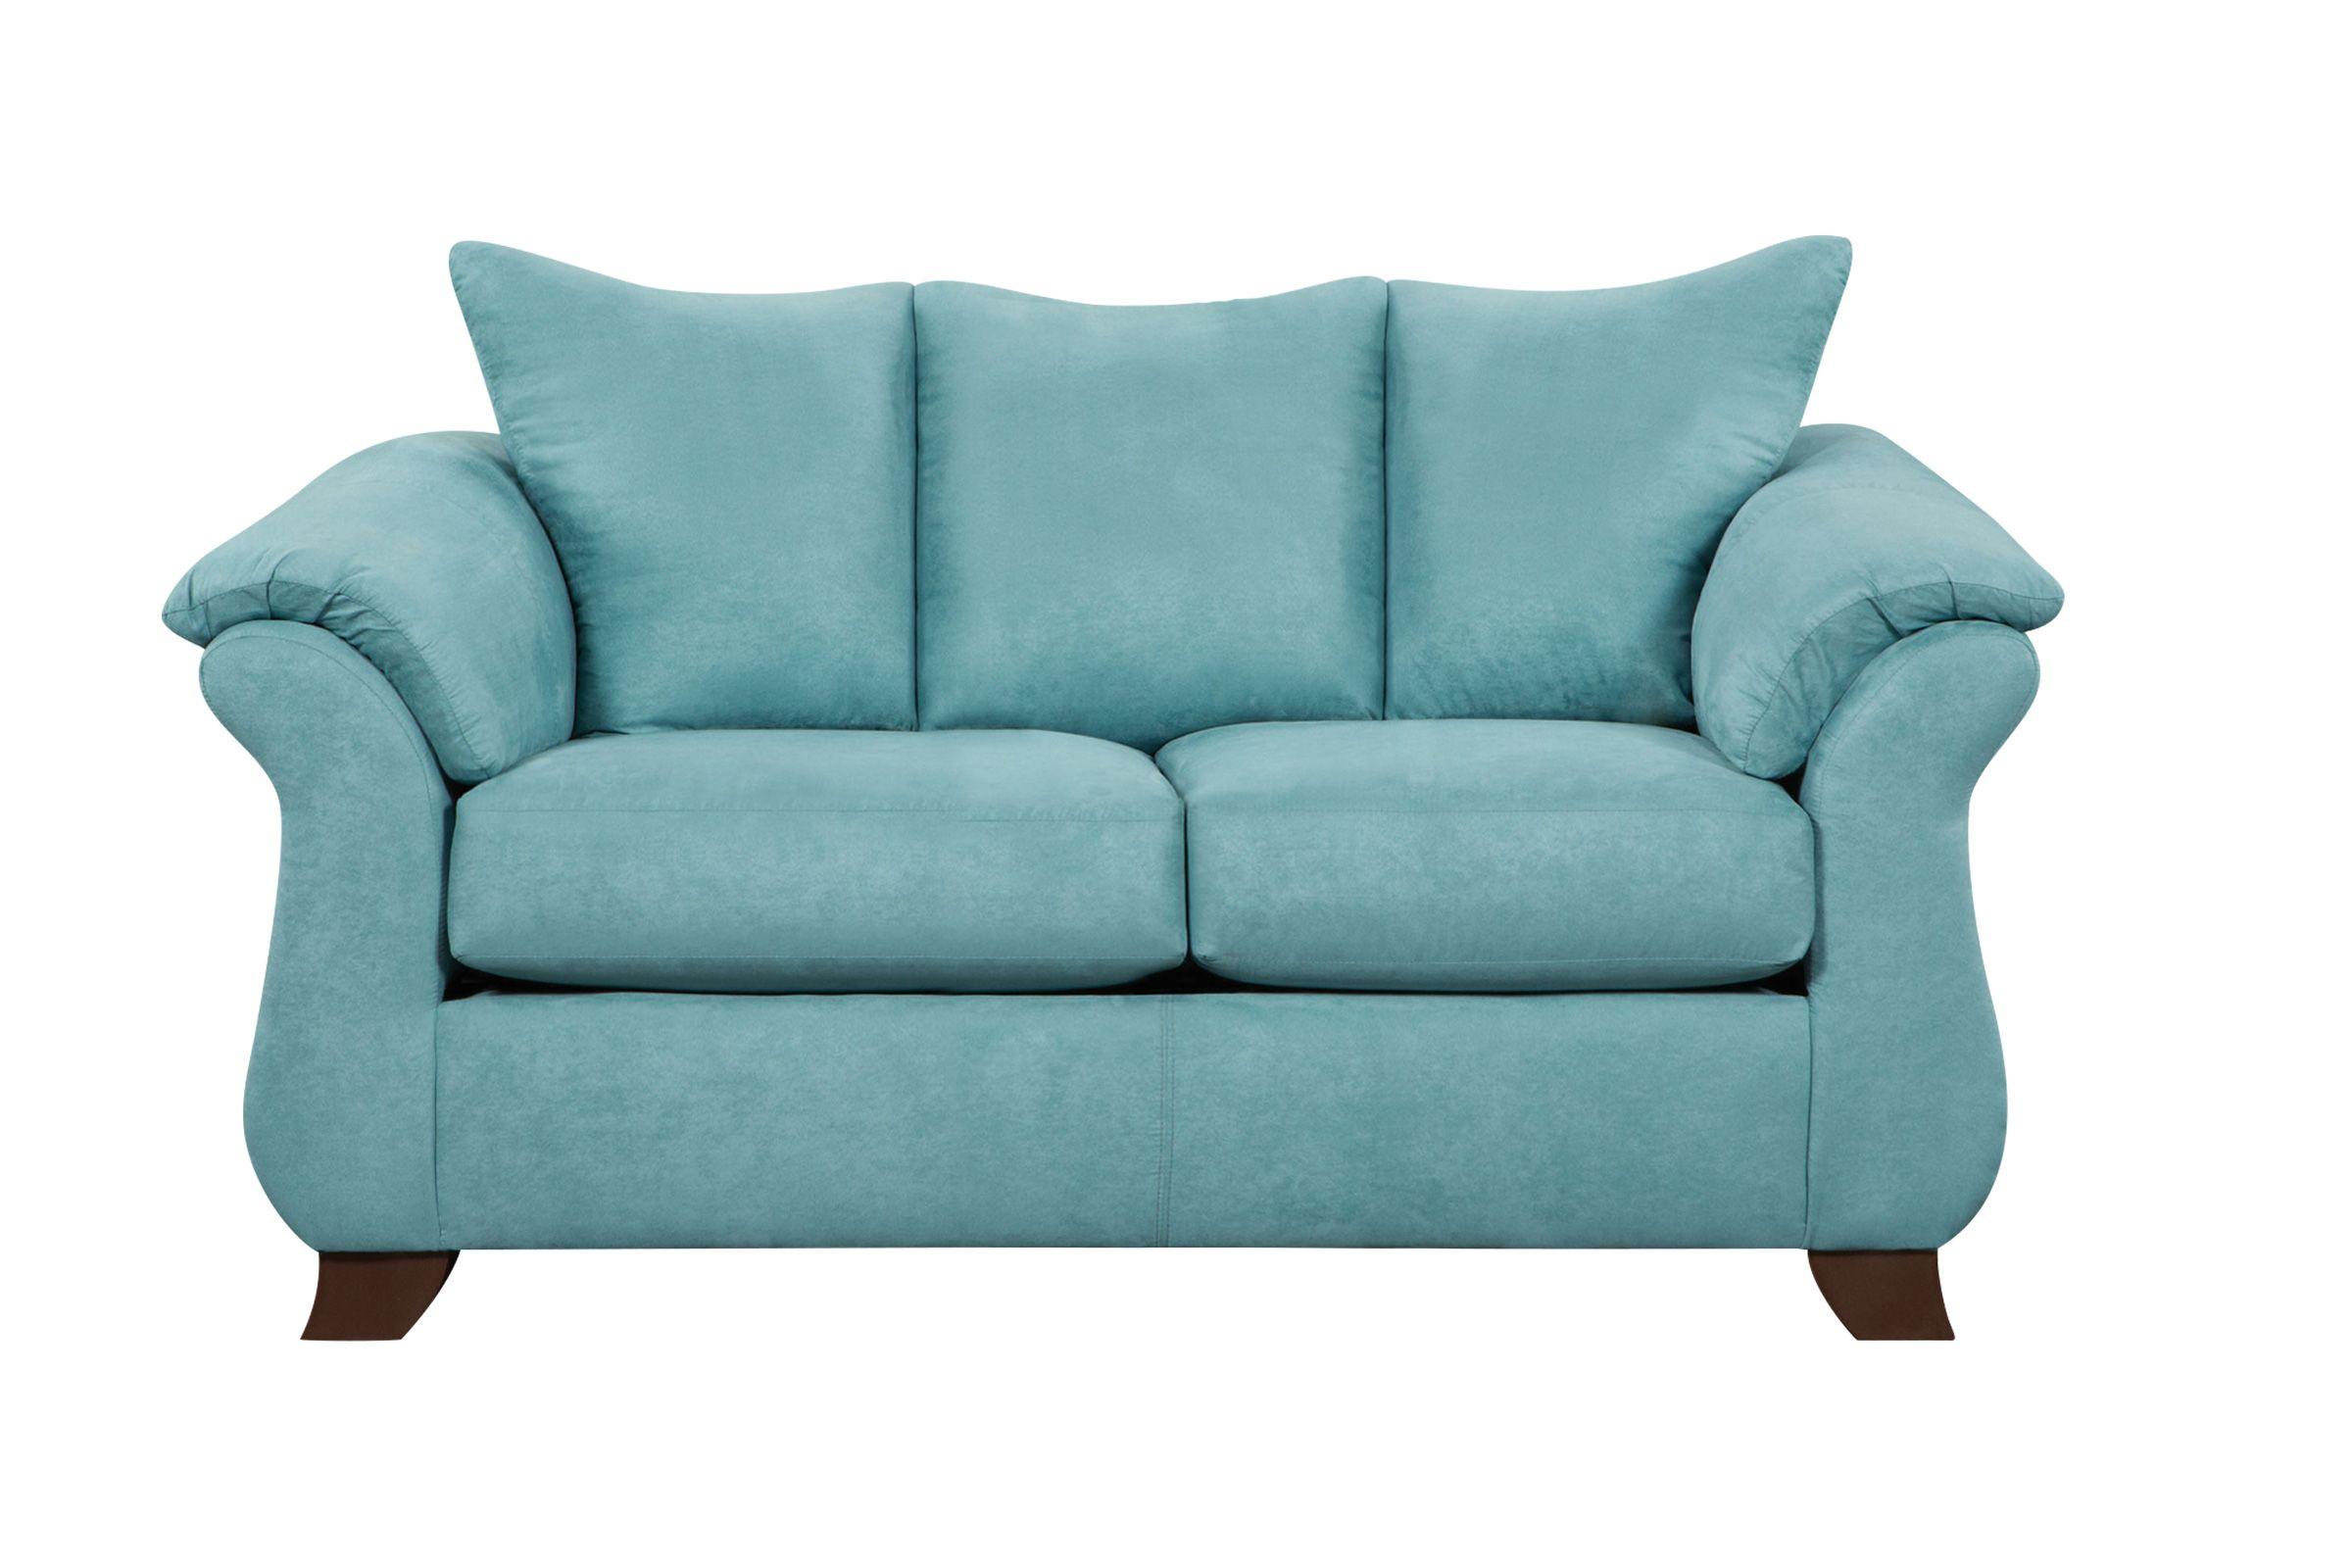 Taffy Microfiber Loveseat In 2020 Sleeper Sofa Microfiber Sofa